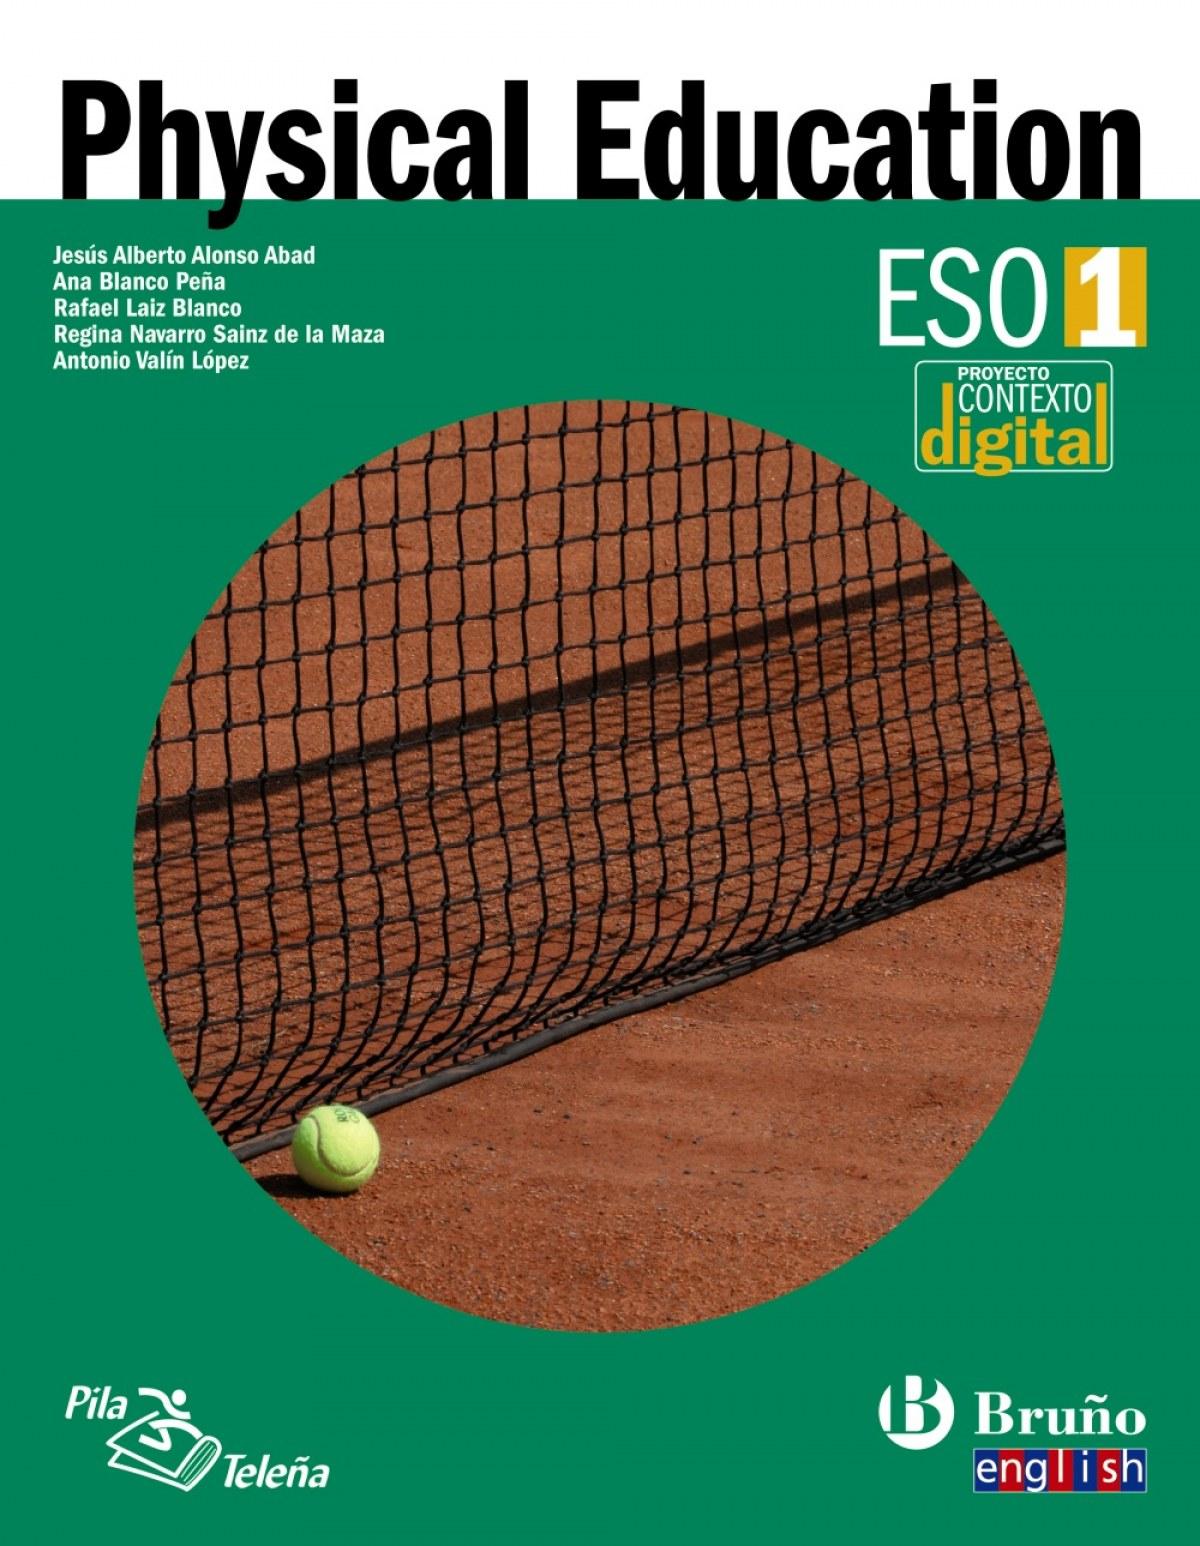 PHYSICAL EDUCATION 1º.ESO (EDUCACION FISICA INGLES)